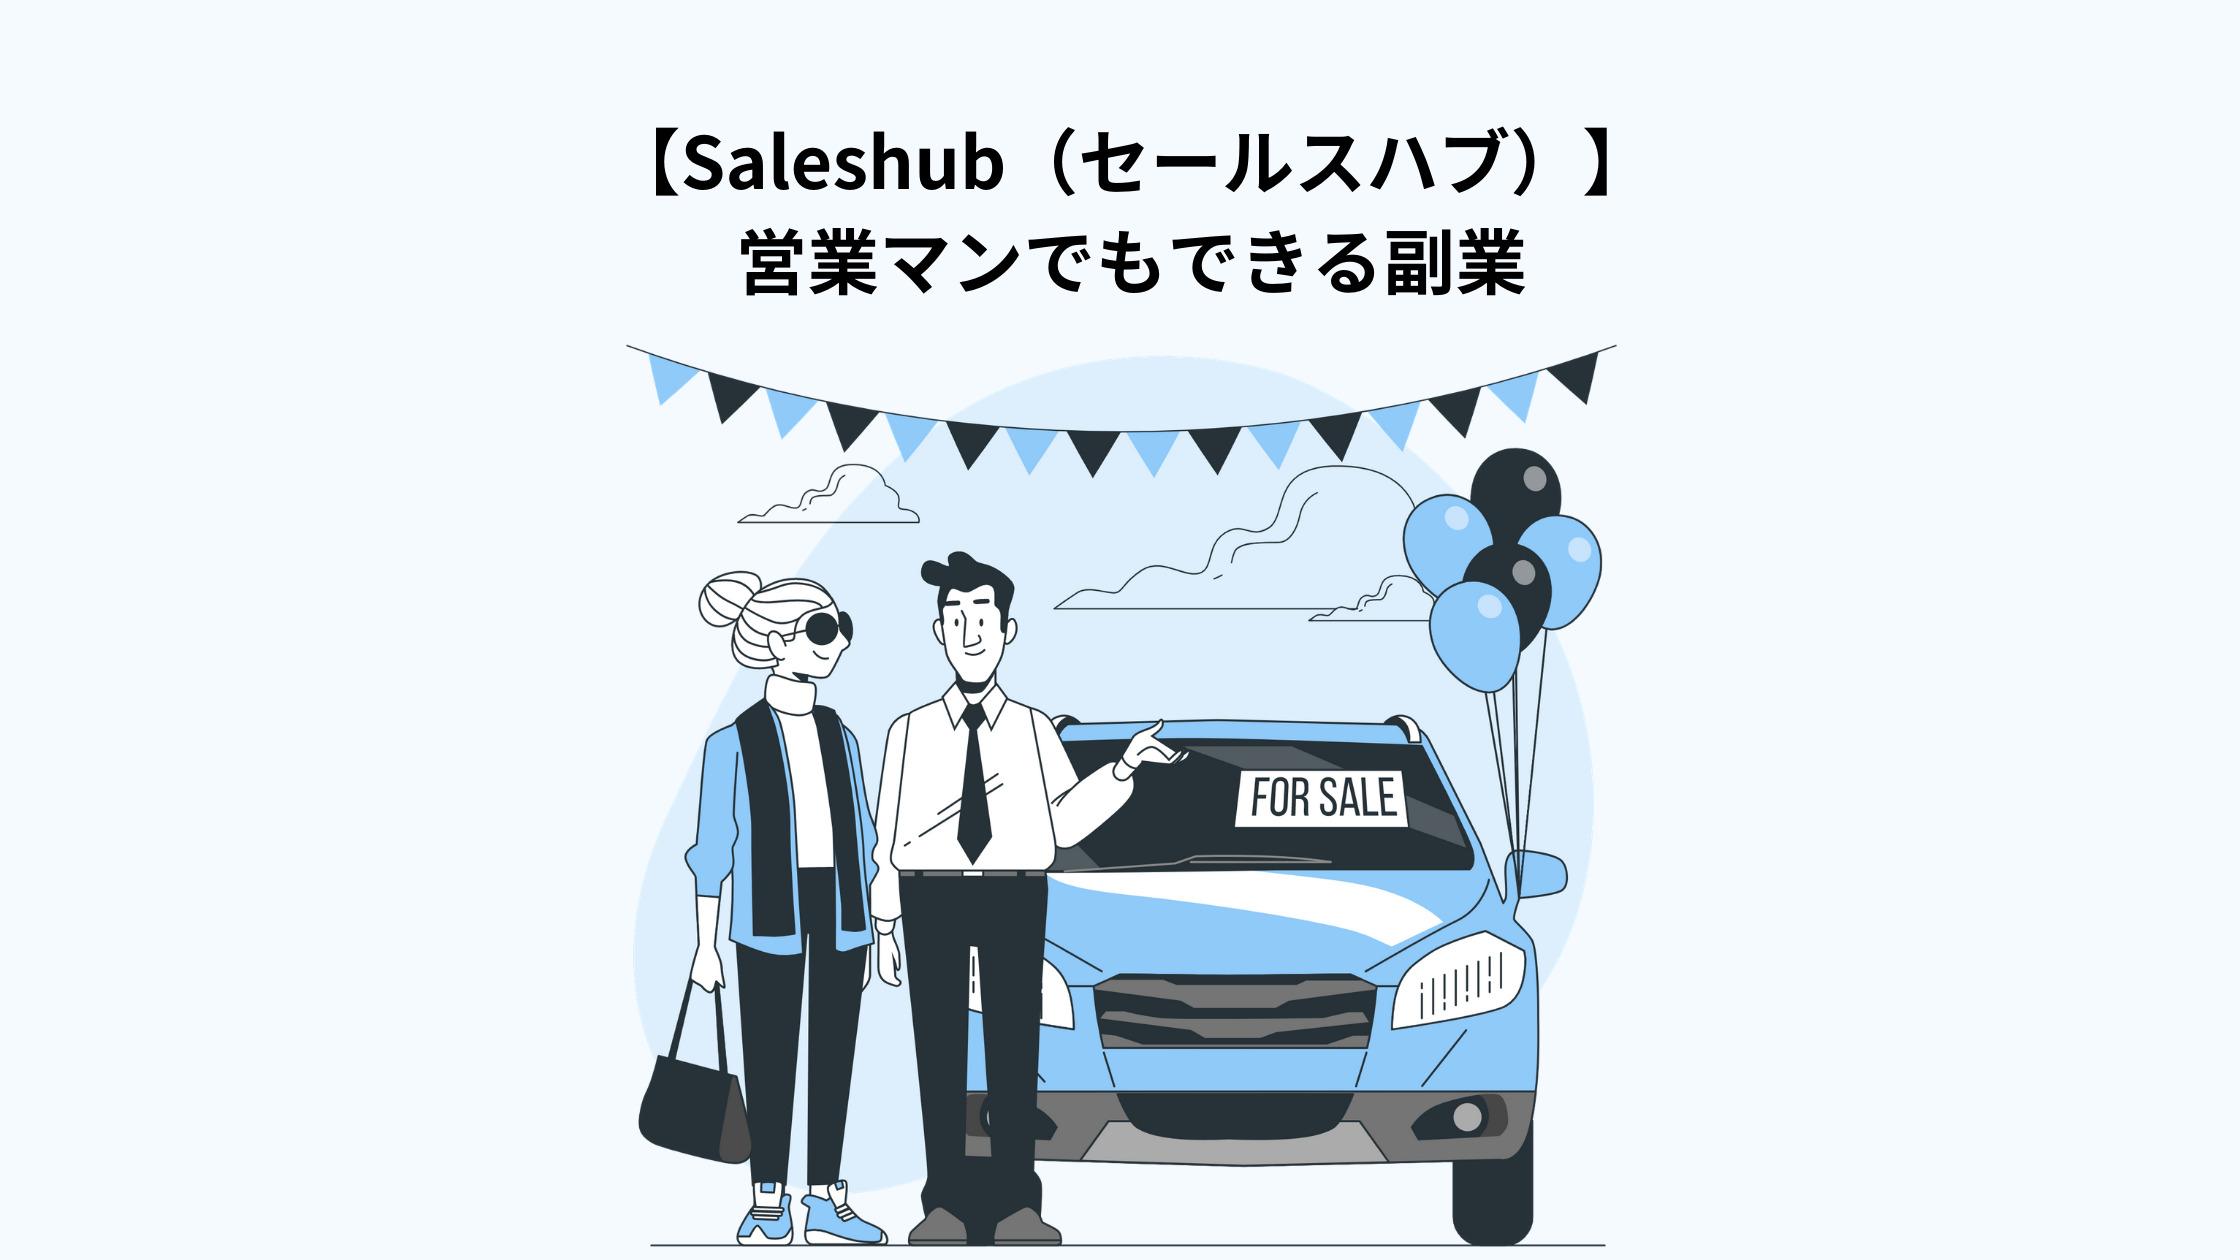 【Saleshub(セールスハブ)】 営業マンでもできる副業